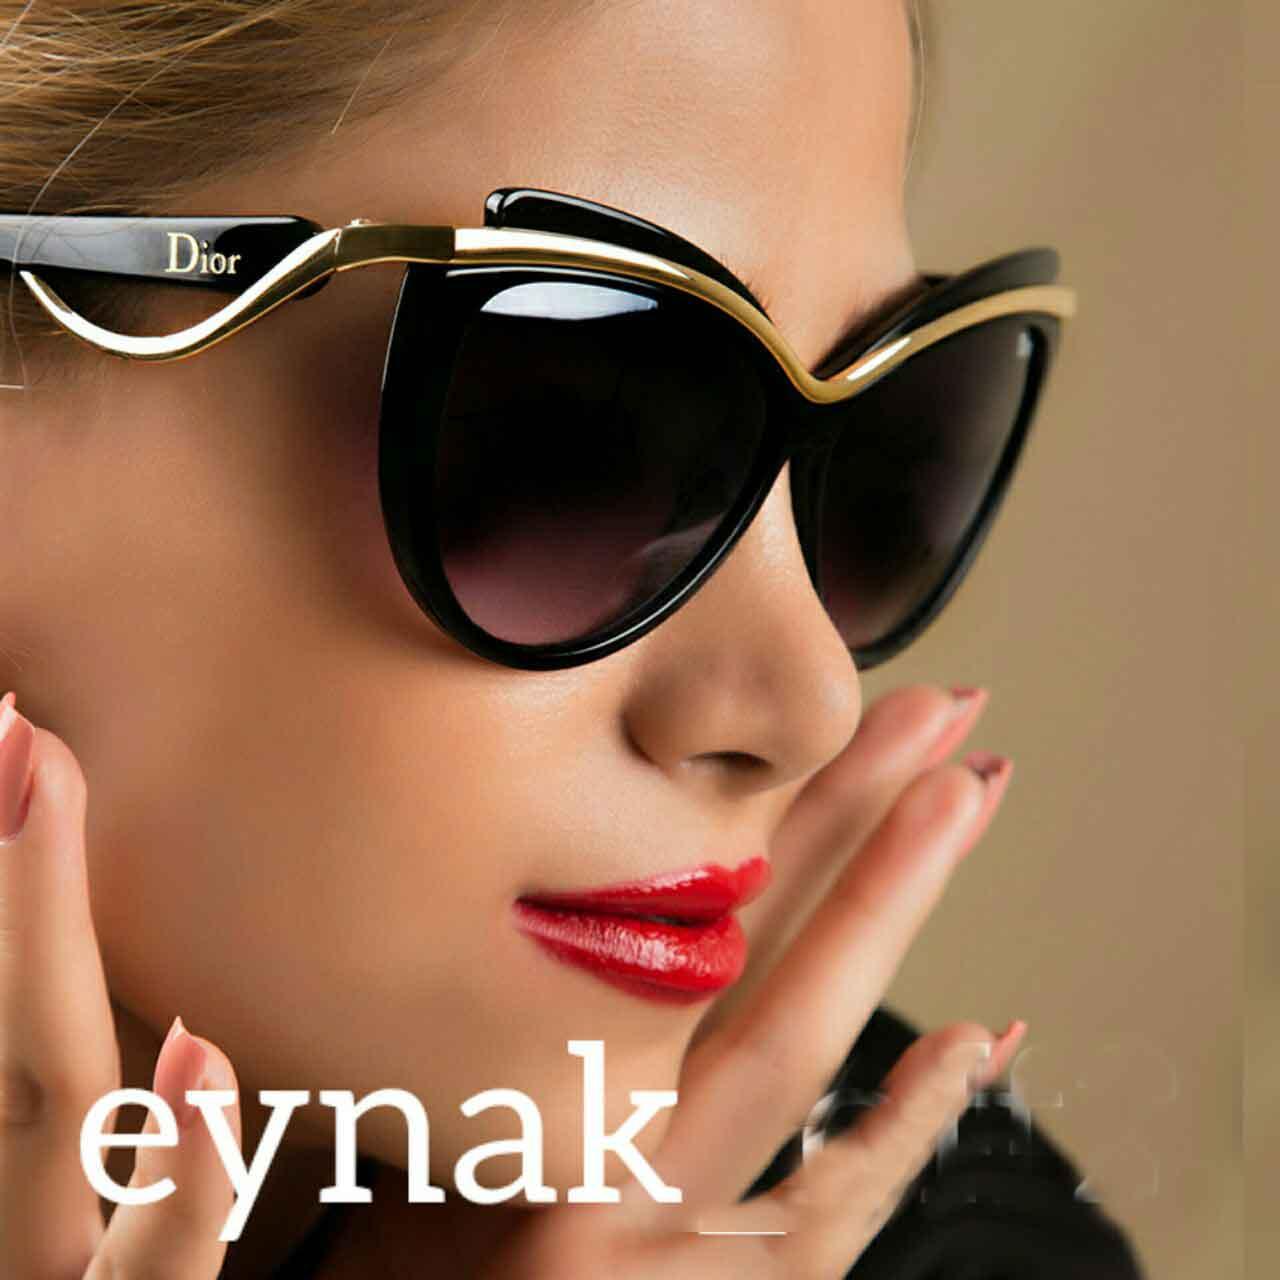 عینک دودی زنانه دیور